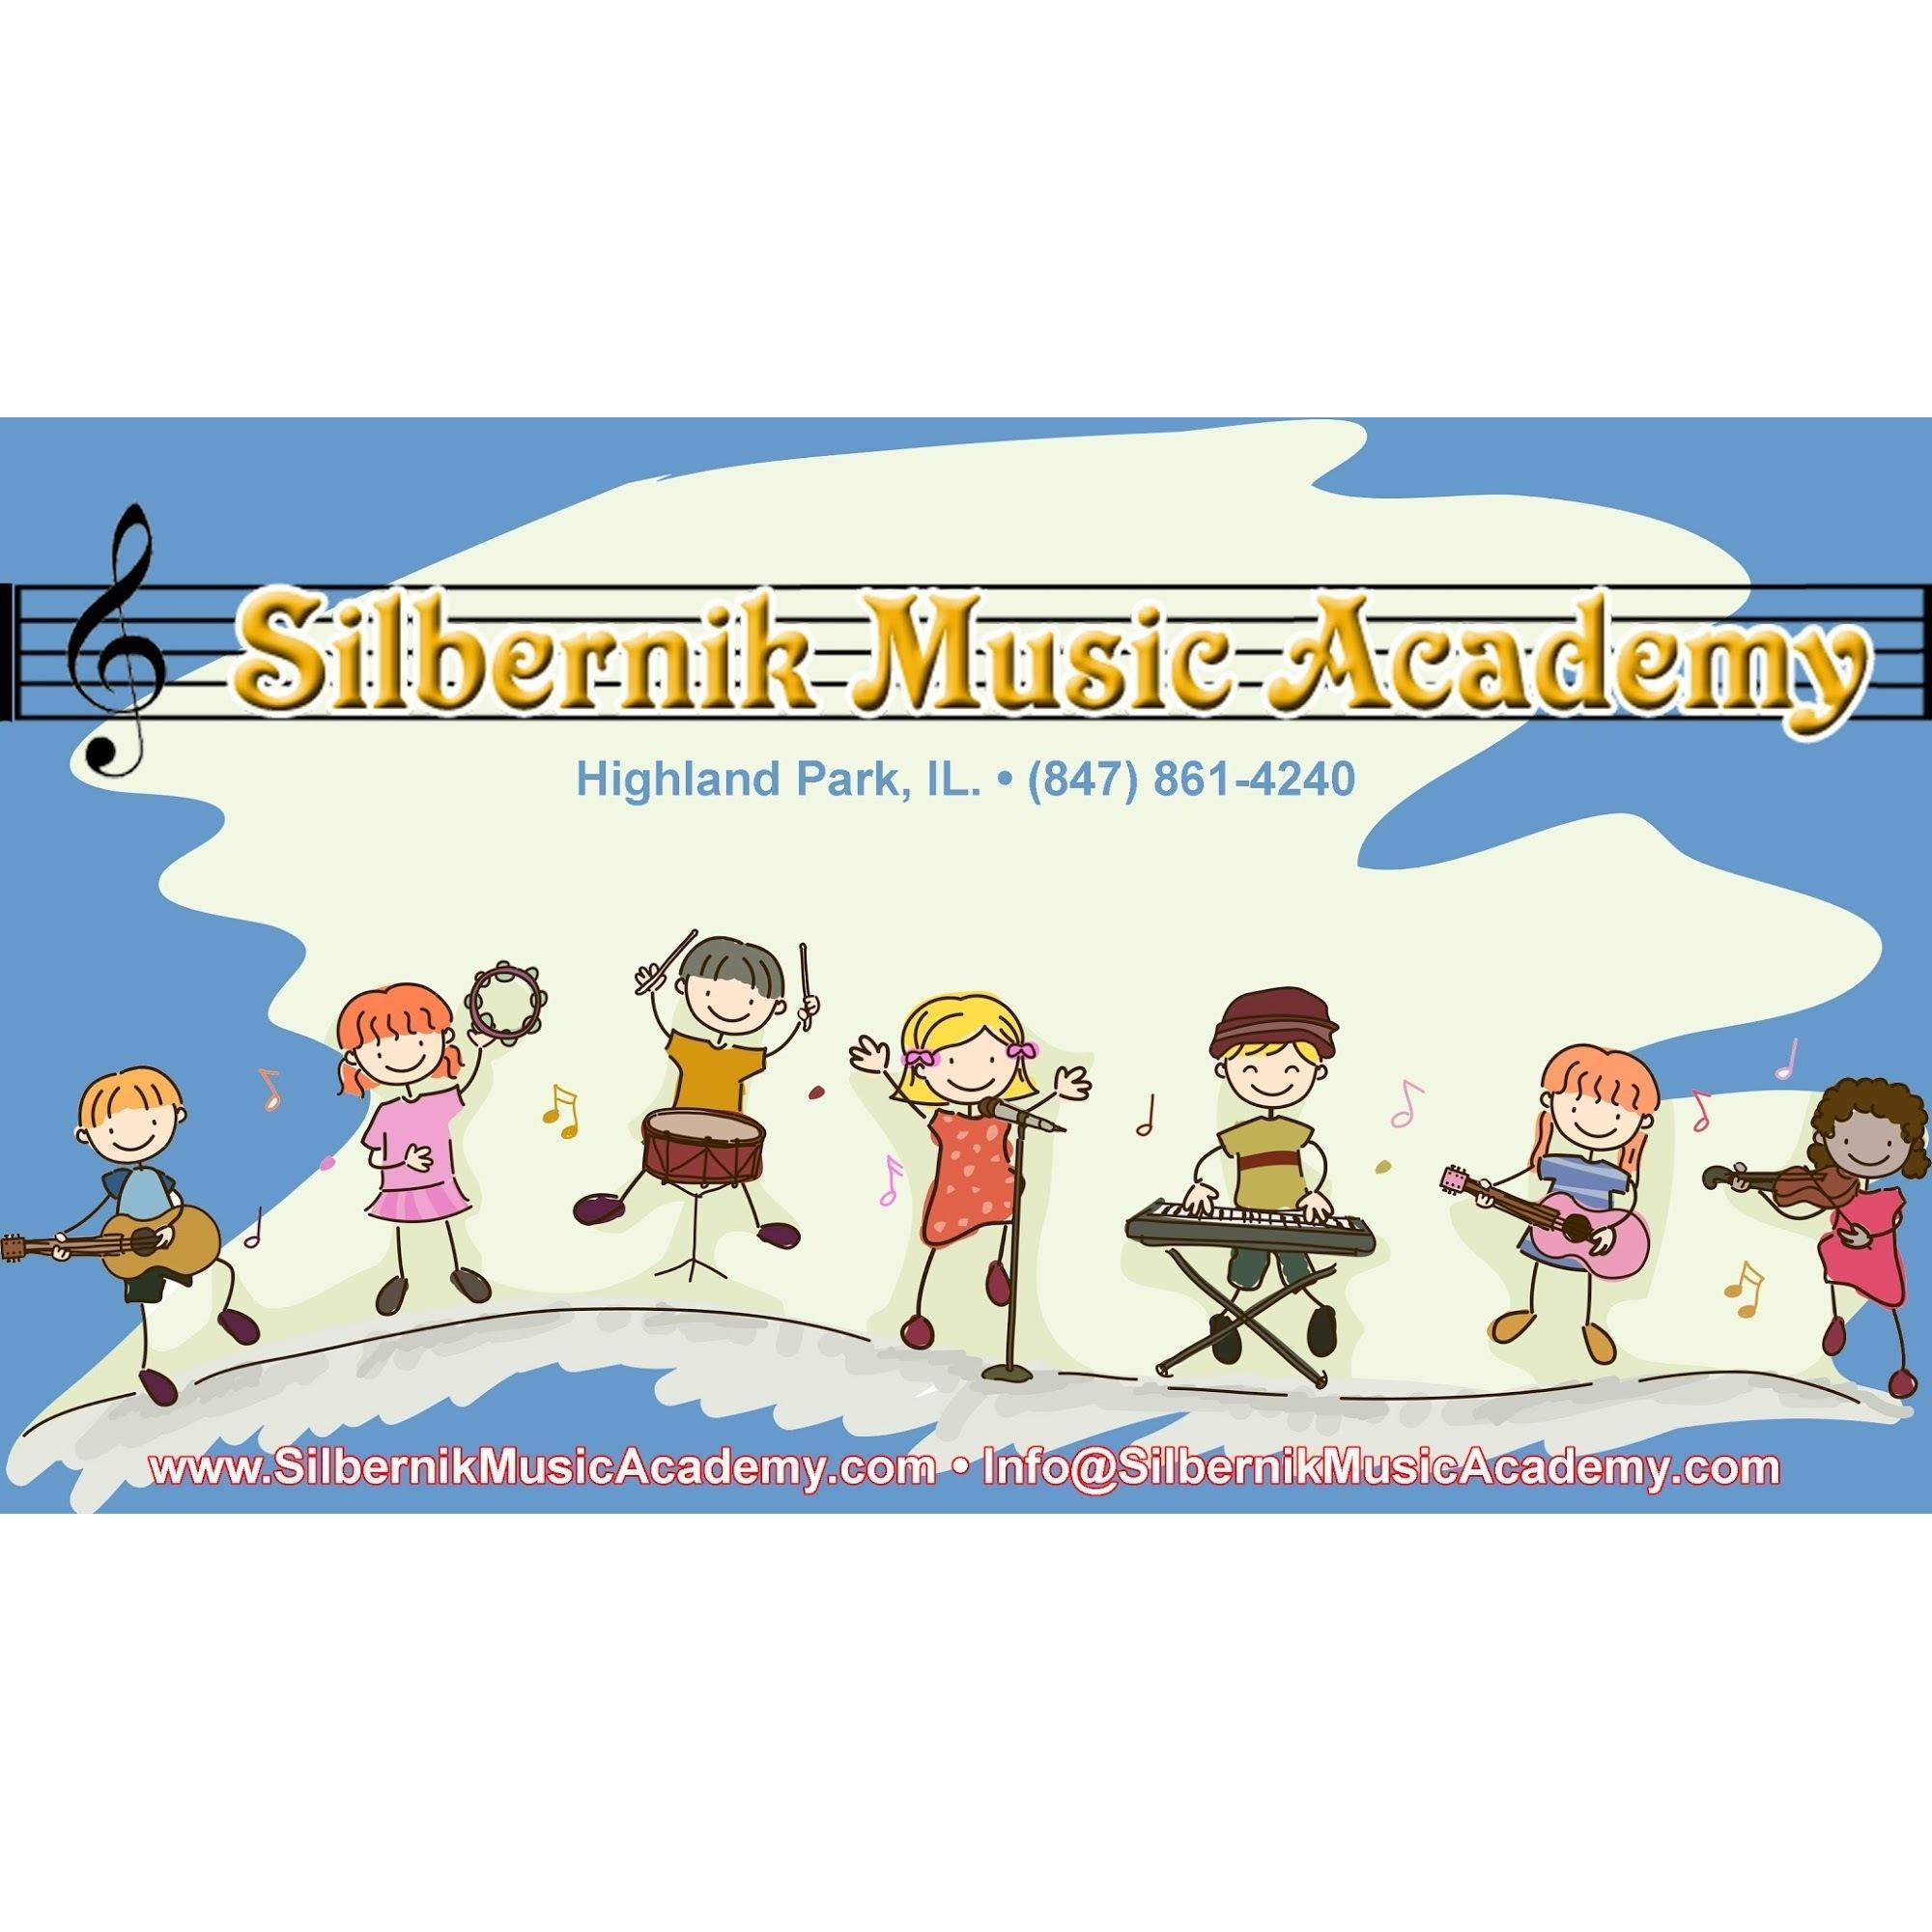 Silbernik Music Academy